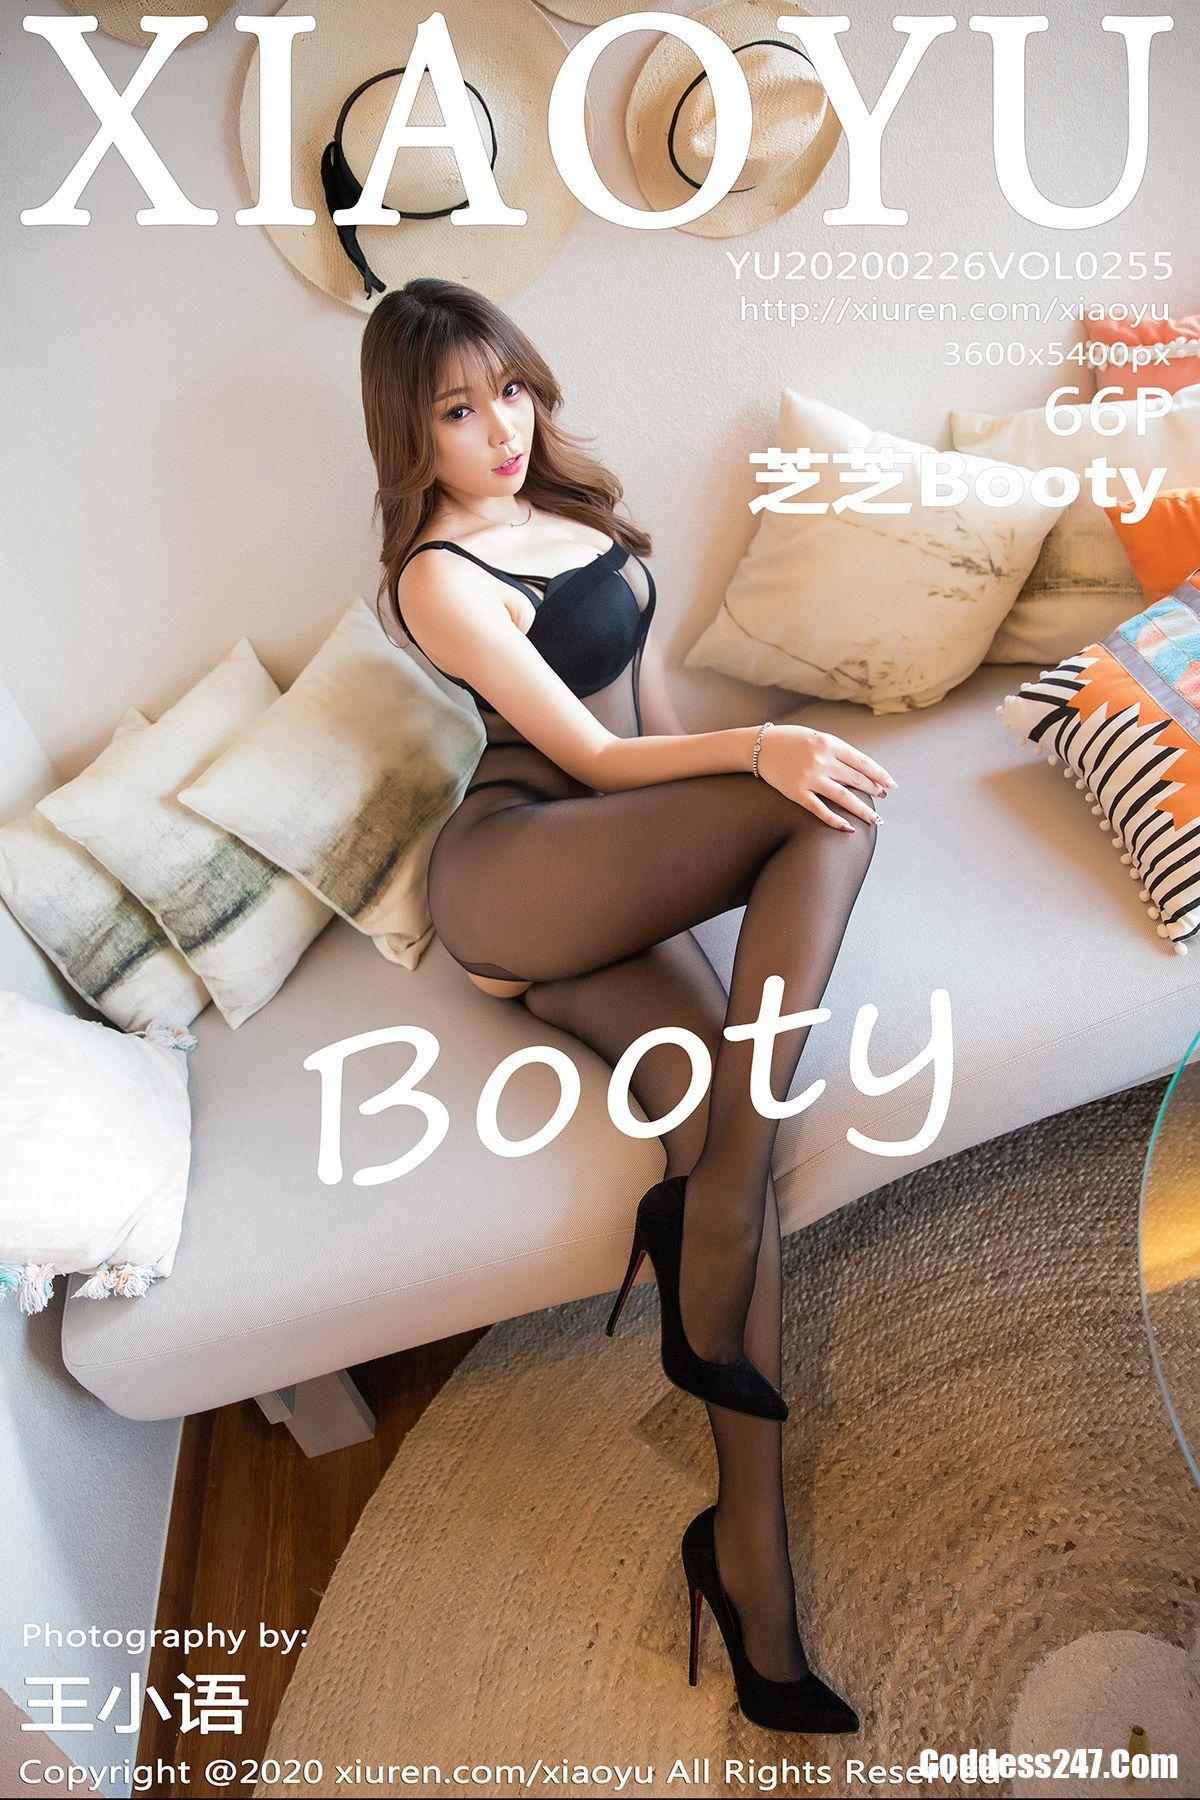 XiaoYu Vol.255 芝芝Booty